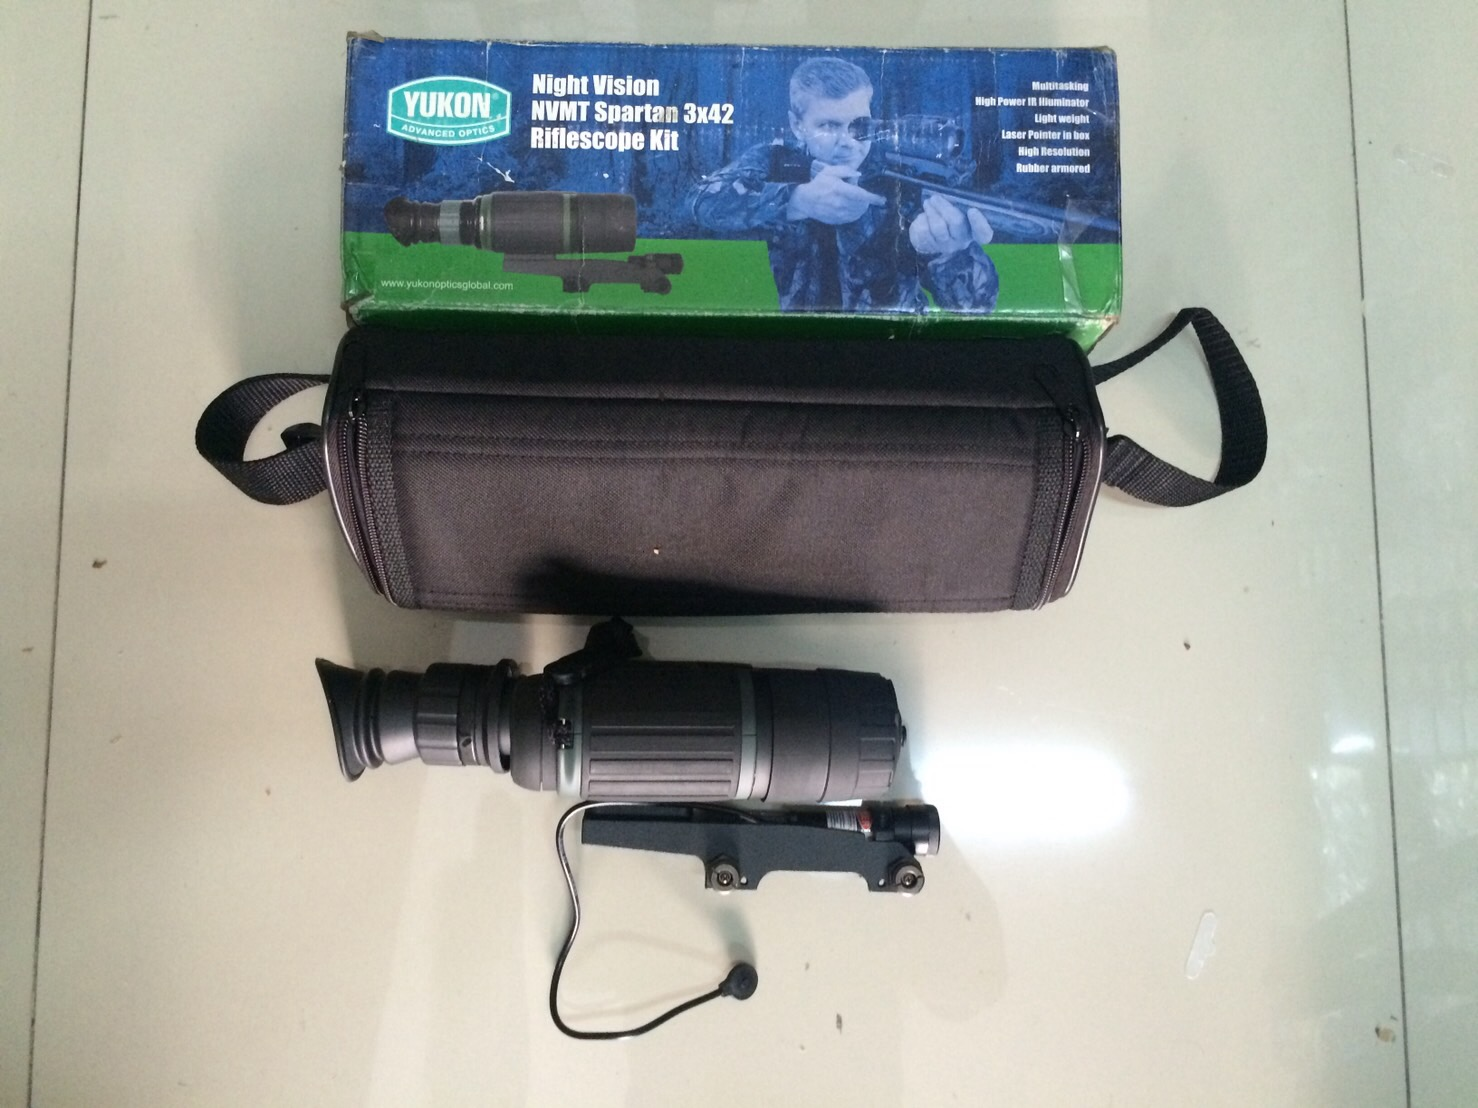 New..Yukon 3x42 NVMT Spartan Night Vision Riflescope Kit